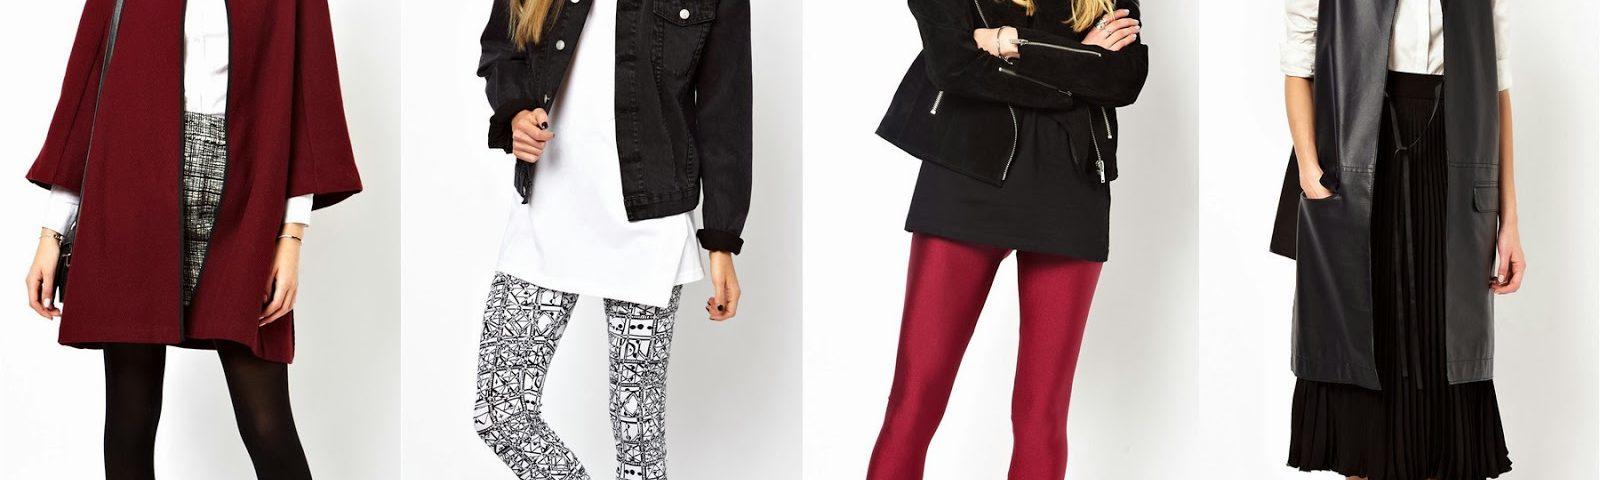 Plus Size Clothing - A Large Problem For Plus Size Women